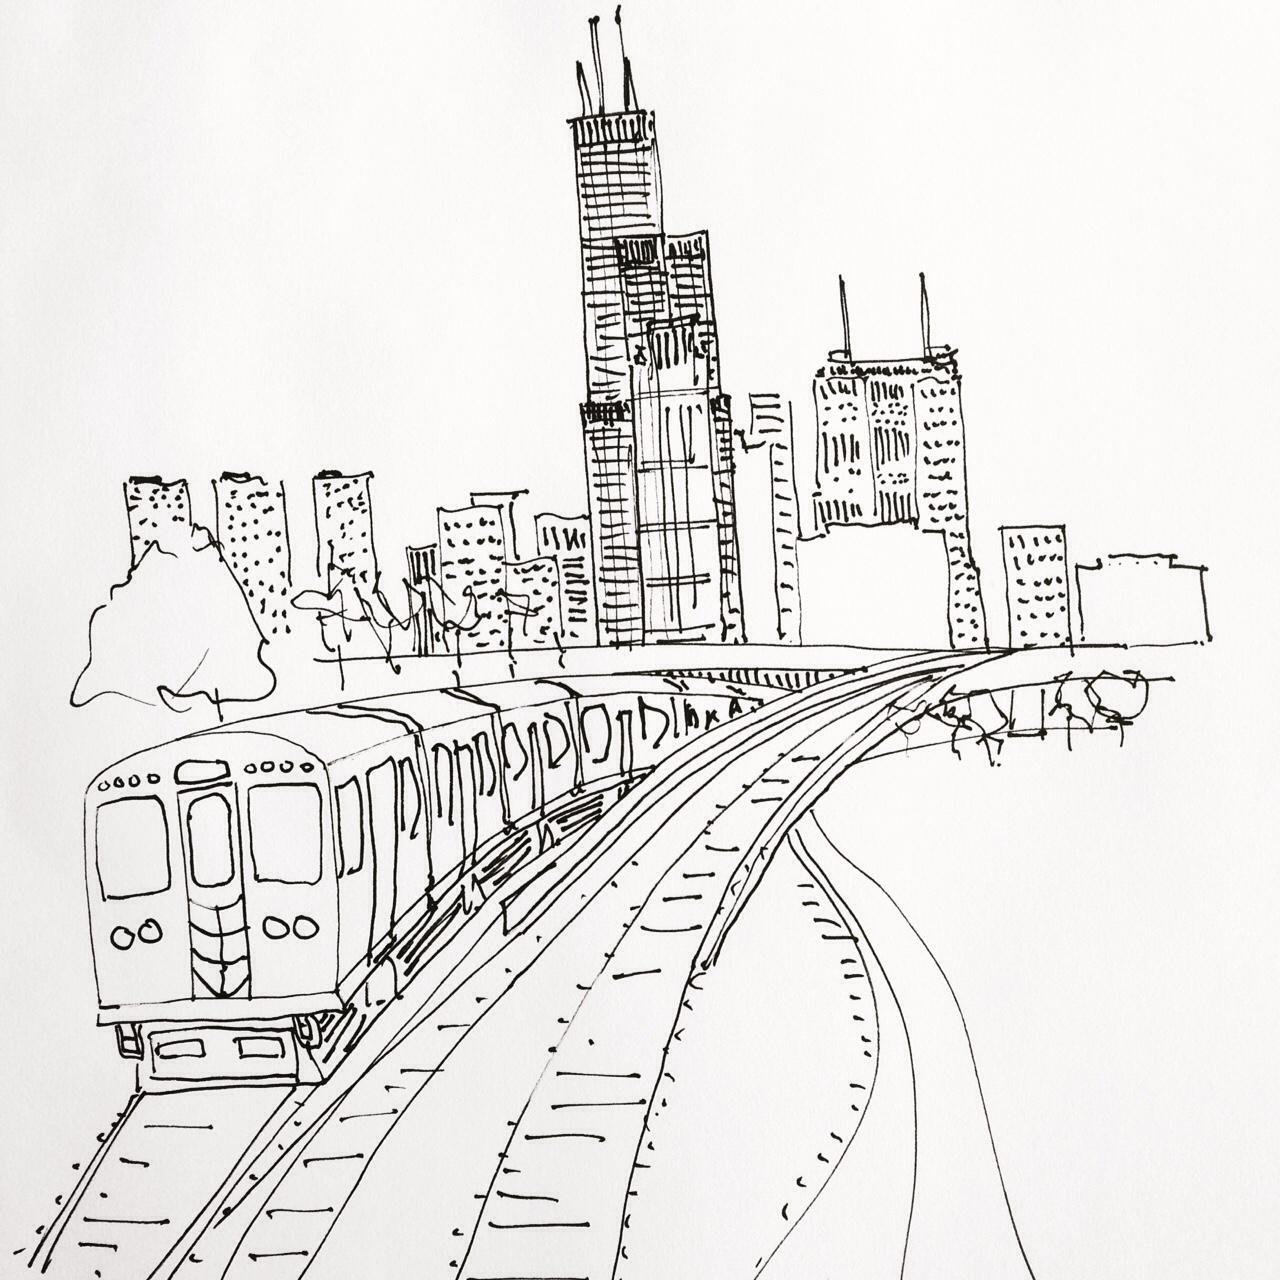 1280x1280 Sketchbook Art Of Chicago Skyline L Train Drawn In Pen